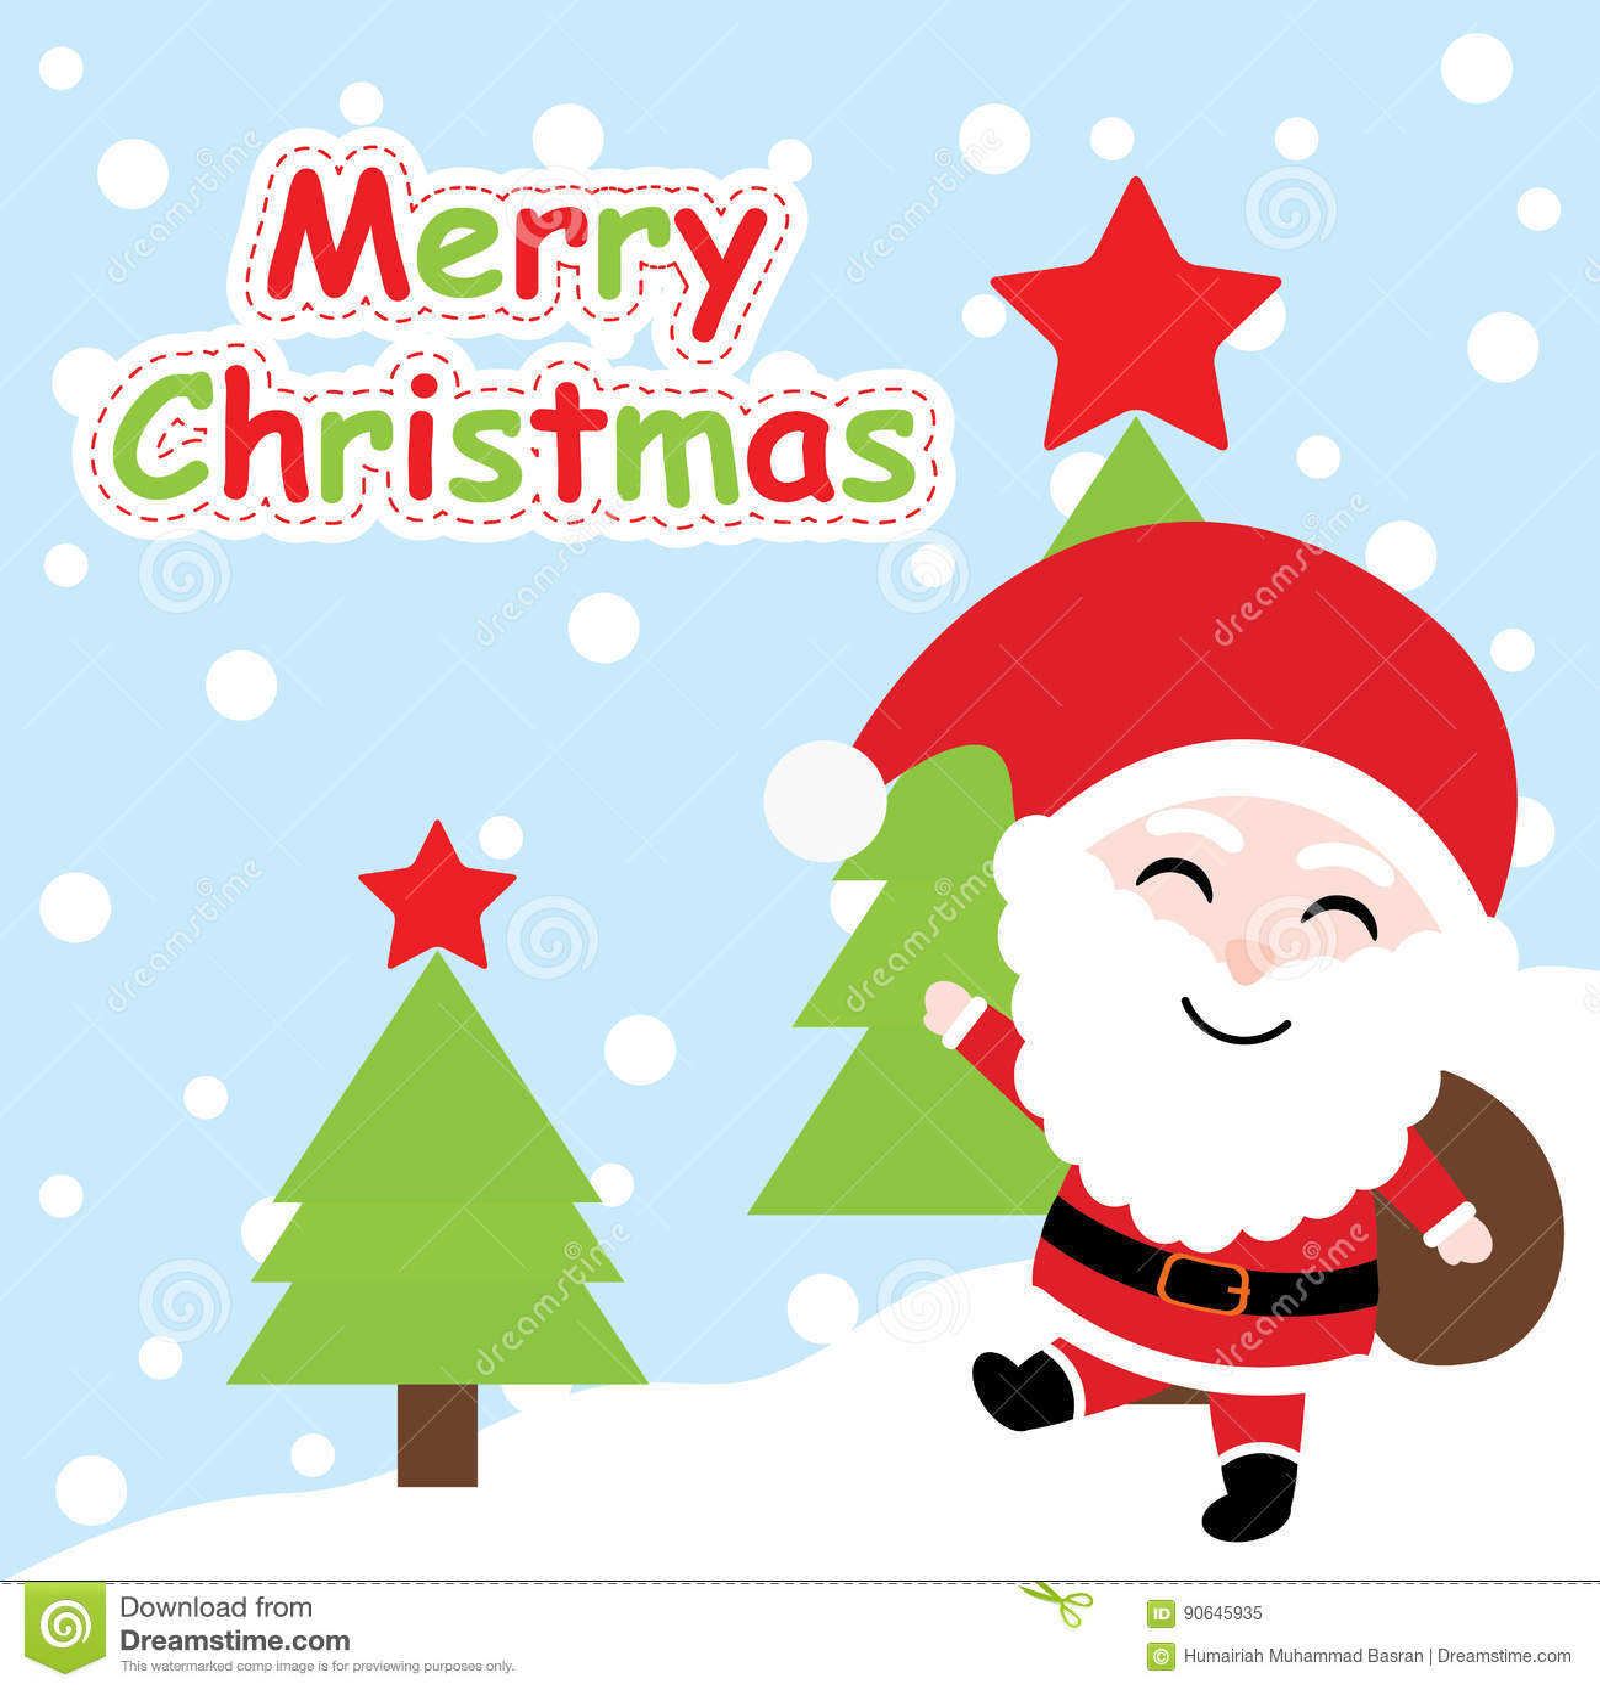 Xmas Card With Cute Santa Claus Cartoon On Xmas Tree Background Xmas Postcard Wallpaper And Greeting Card Stock Vector Illustration Of Santa Happy 90645935